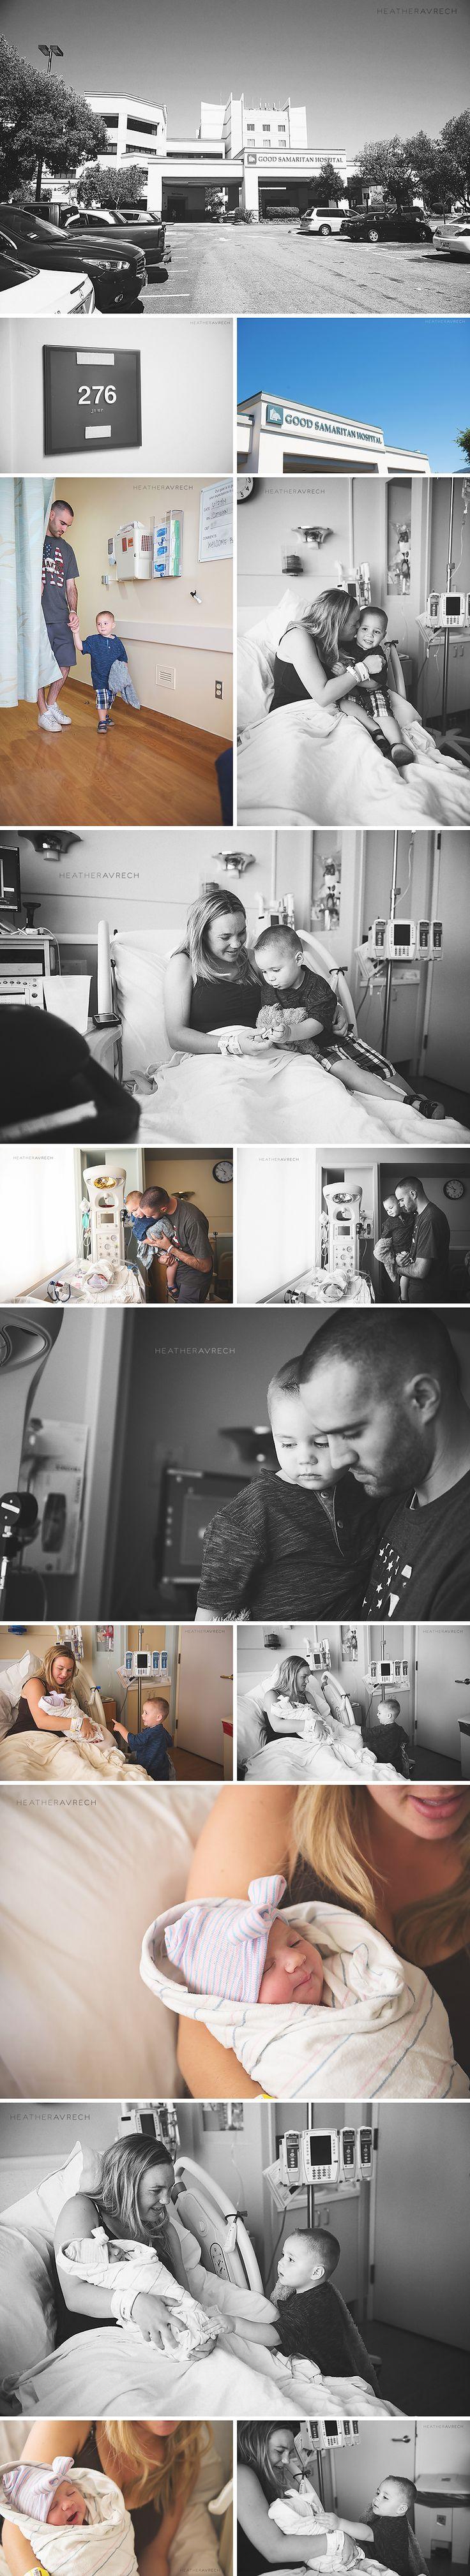 San+Jose+Newborn+Photographer--Heather Avrech Photography #fresh48 #helloworld #hospitalnewbornsession